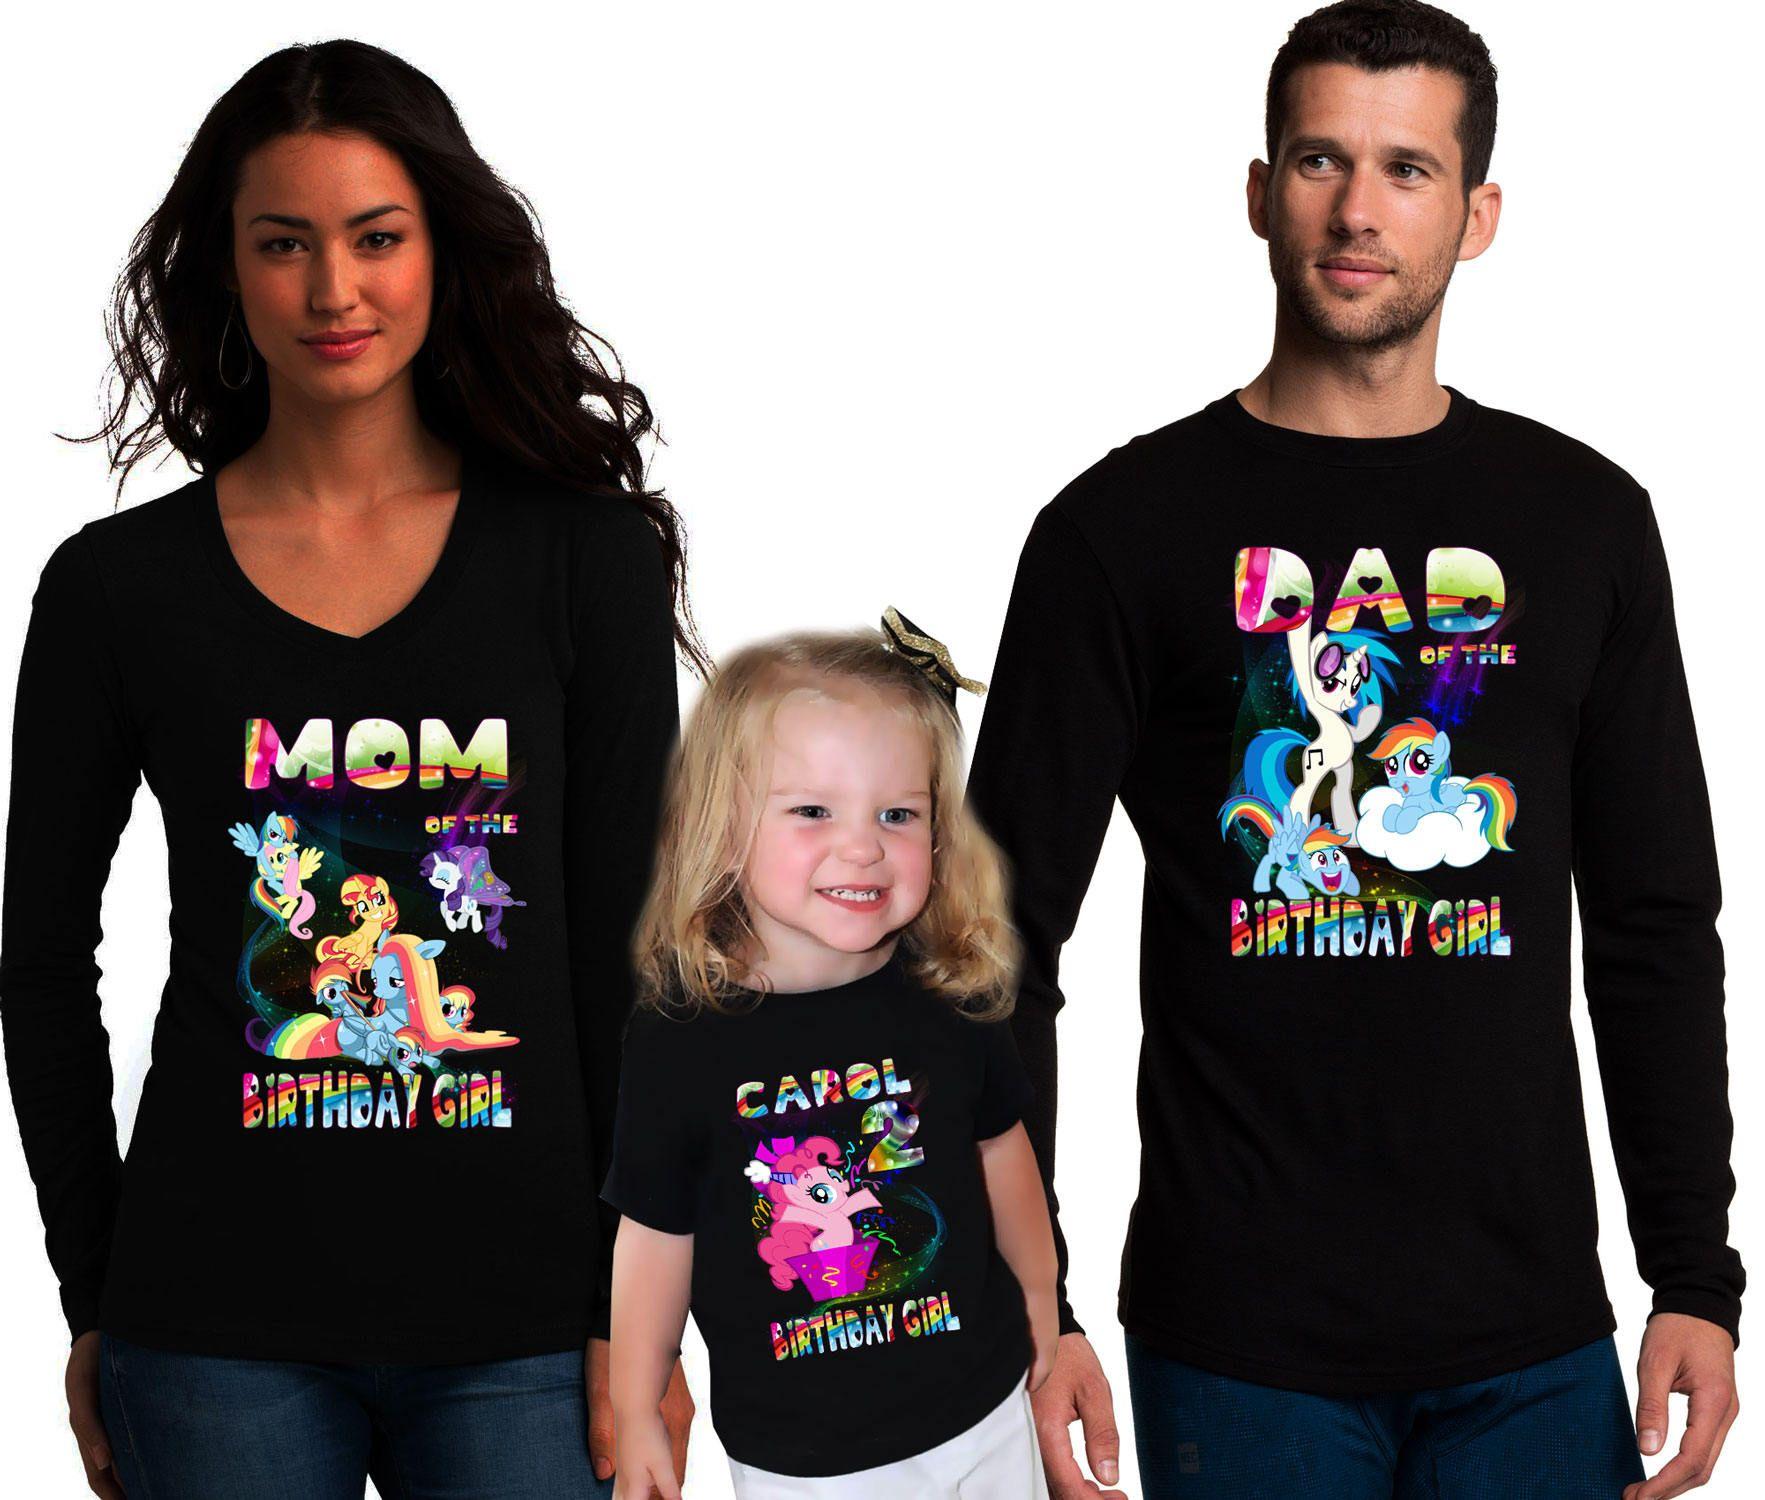 33b8a9f6 My Little Pony Birthday Family Shirts Family Pony Shirts Pony T-Shirt  Twilight Sparkle Shirt Applejack T-Shirt Spike Shirt Pinkie Pie Tee by ...